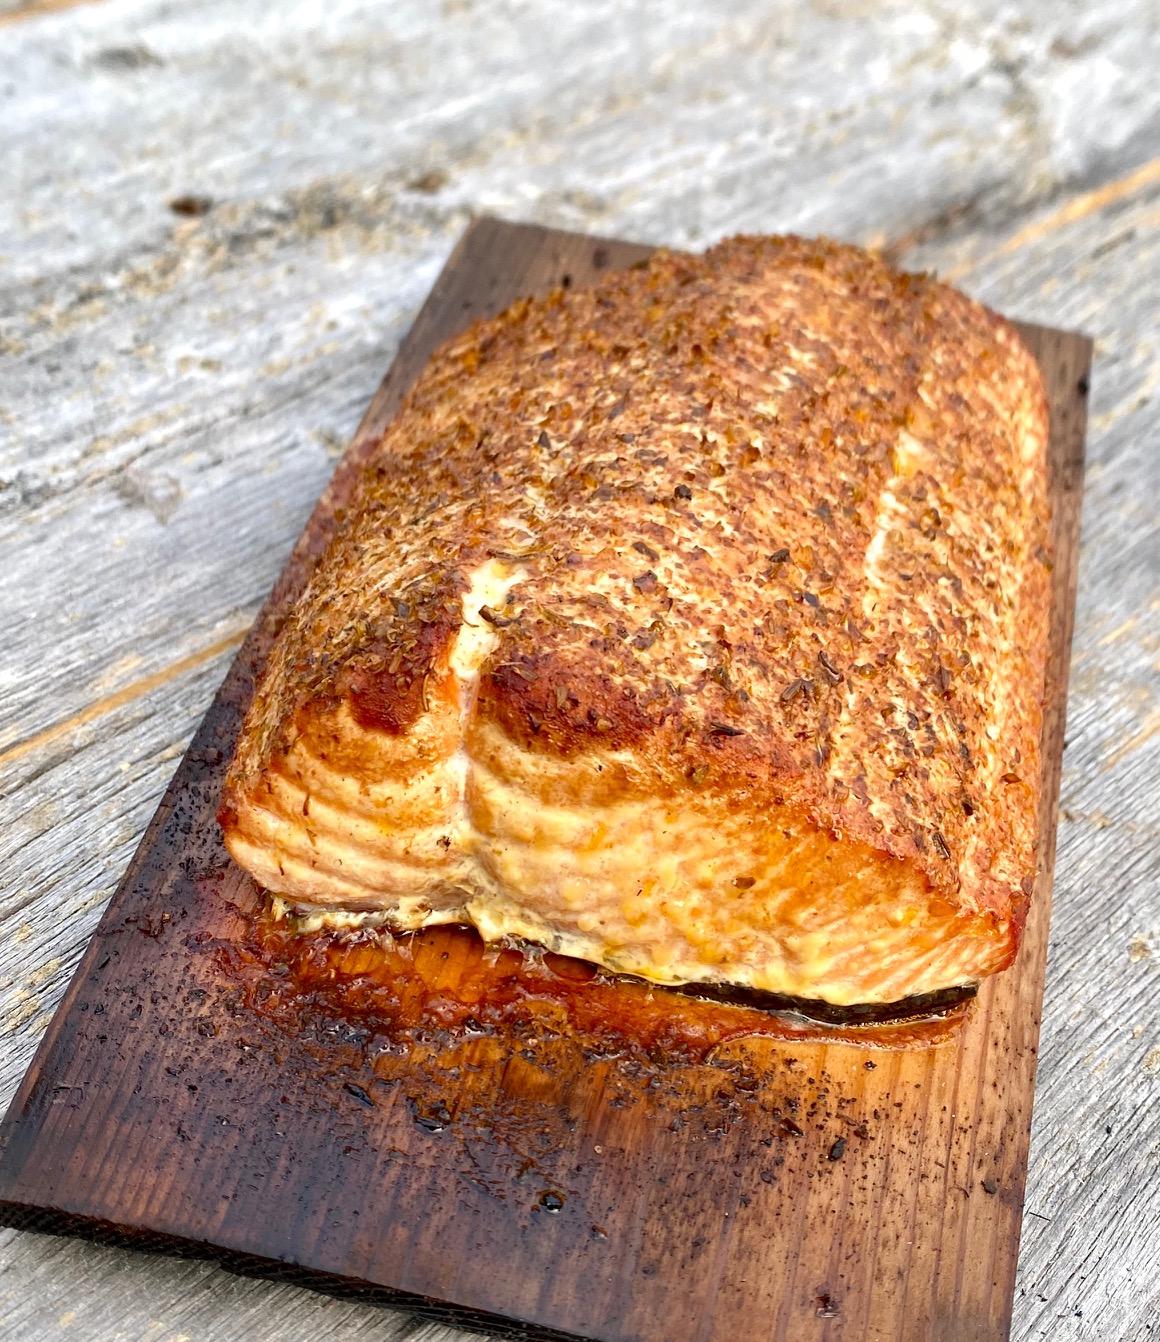 Grilling Salmon on a Cedar Plank